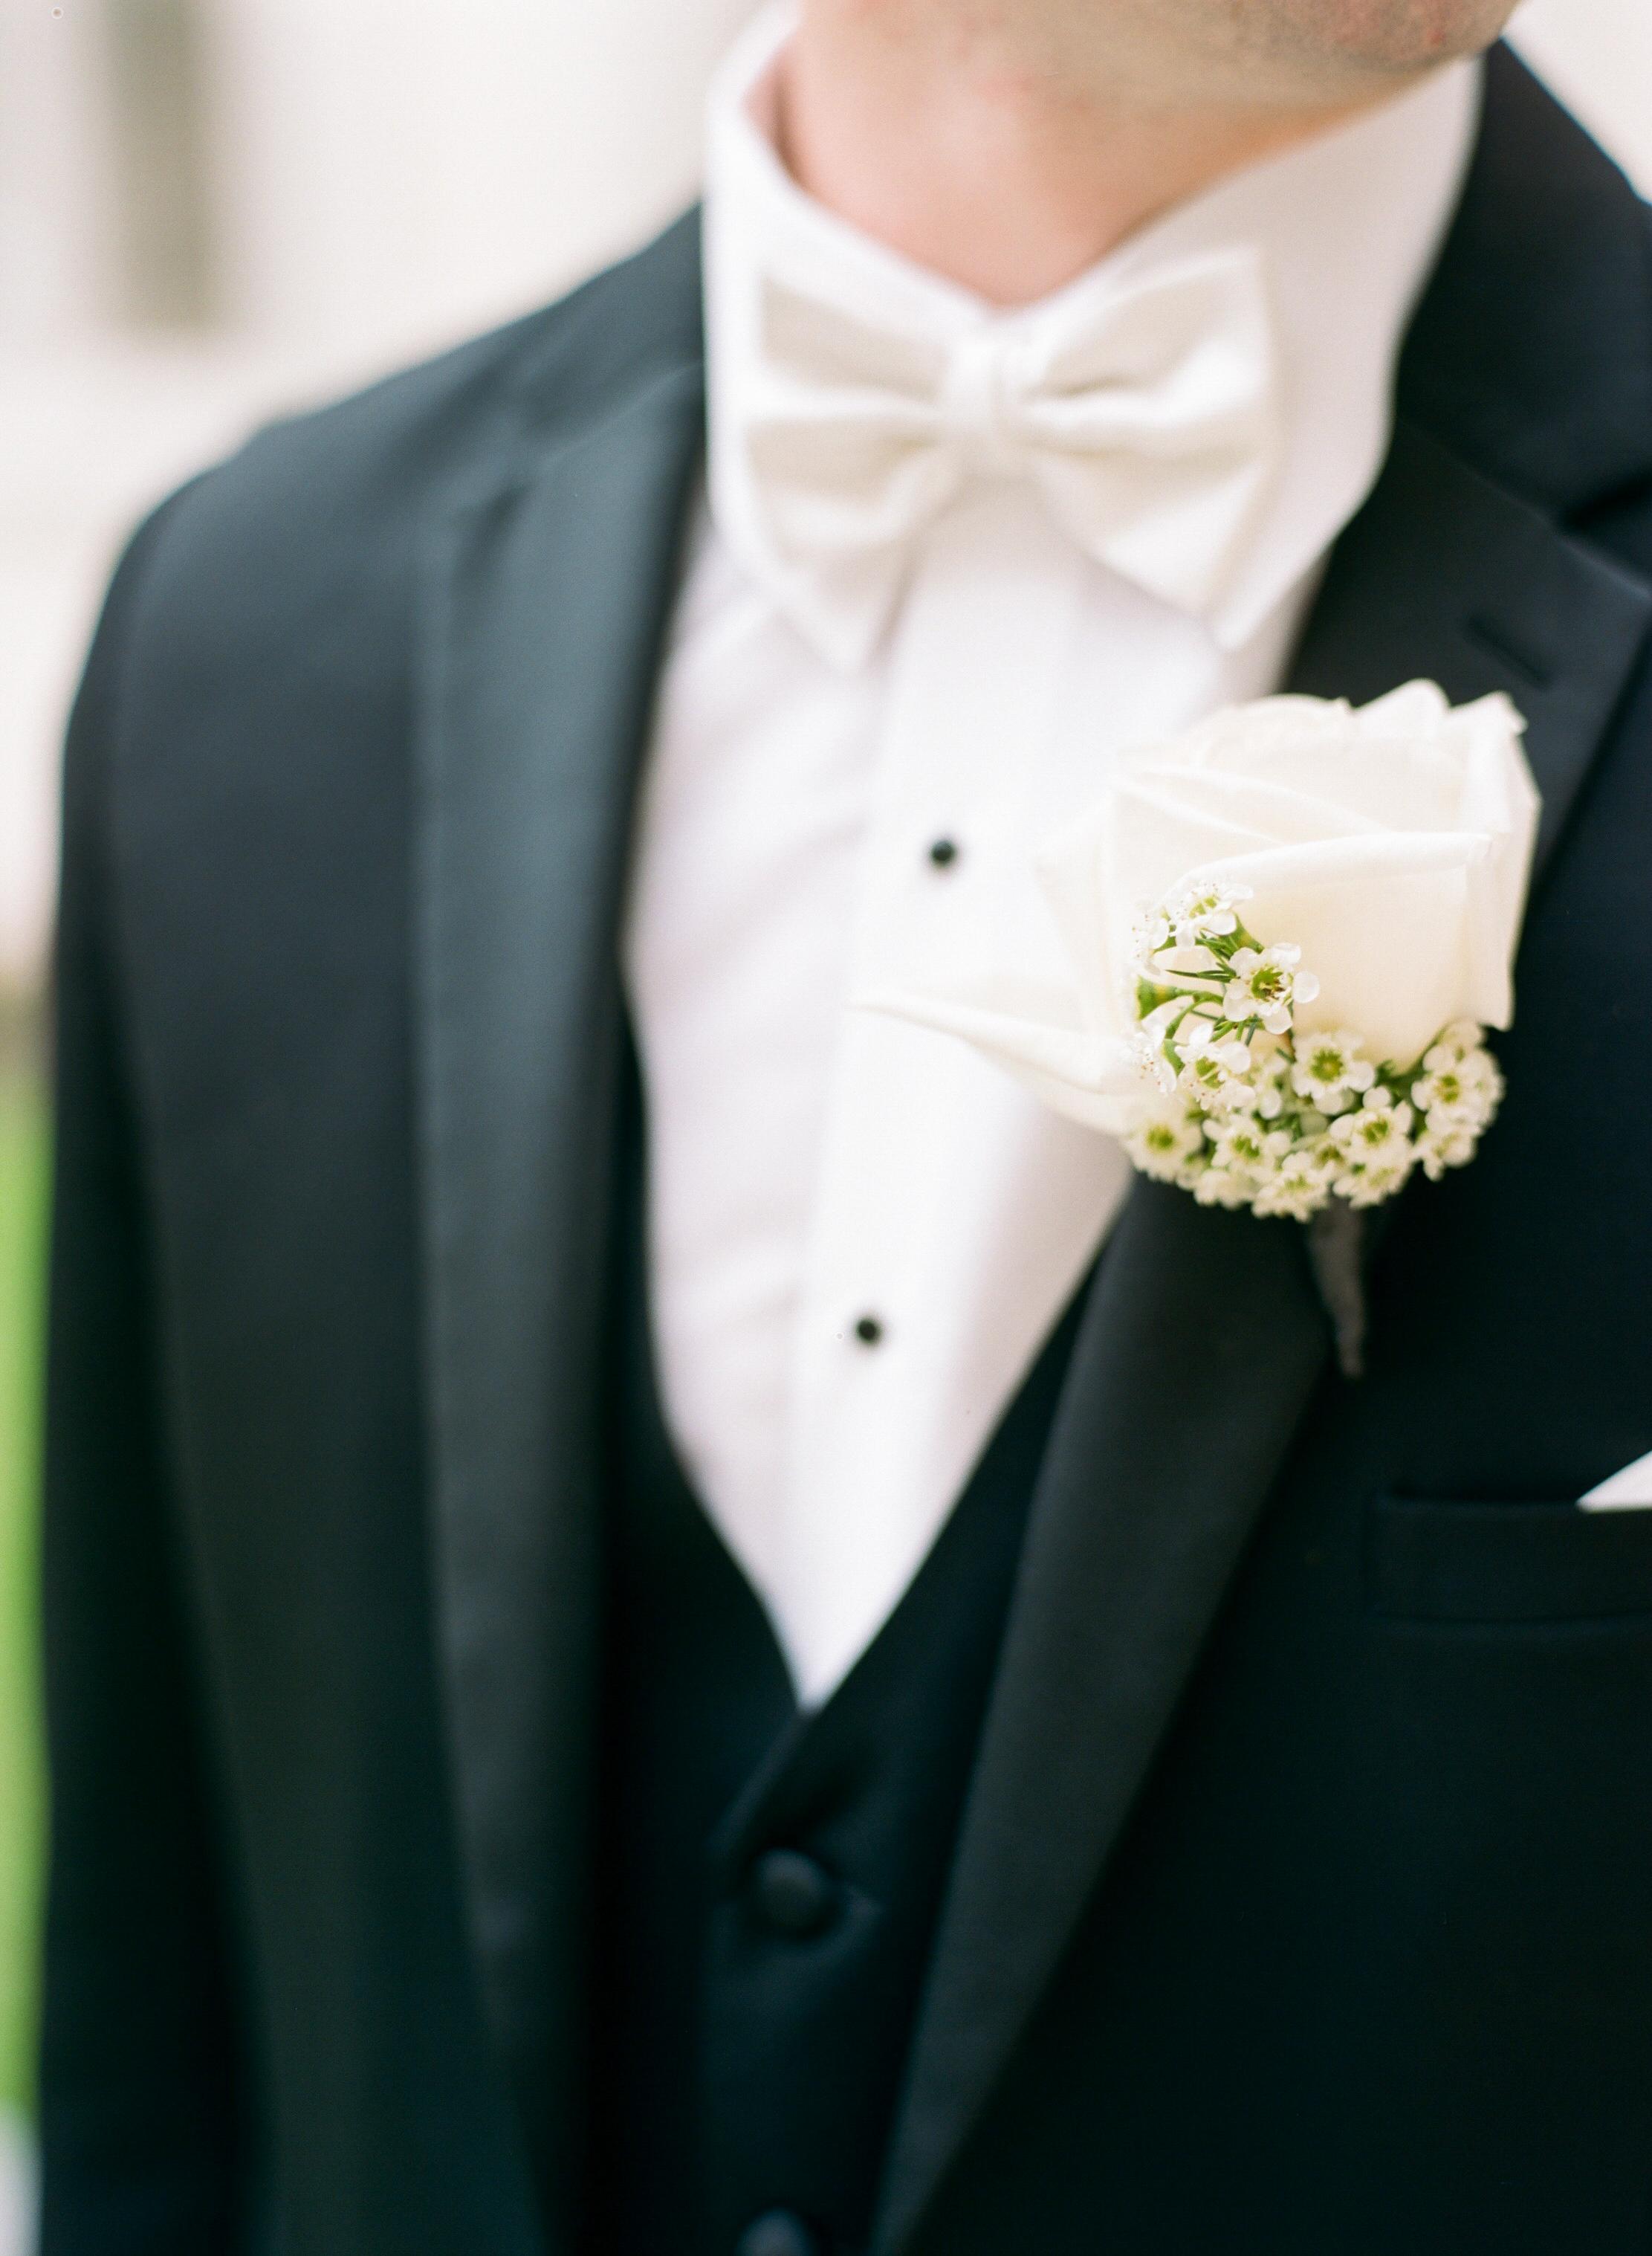 Dana-Fernandez-Photography-Houston-Wedding-Photographer-Style-Me-Pretty-Film-Texas-Destination-Photographer-26.jpg